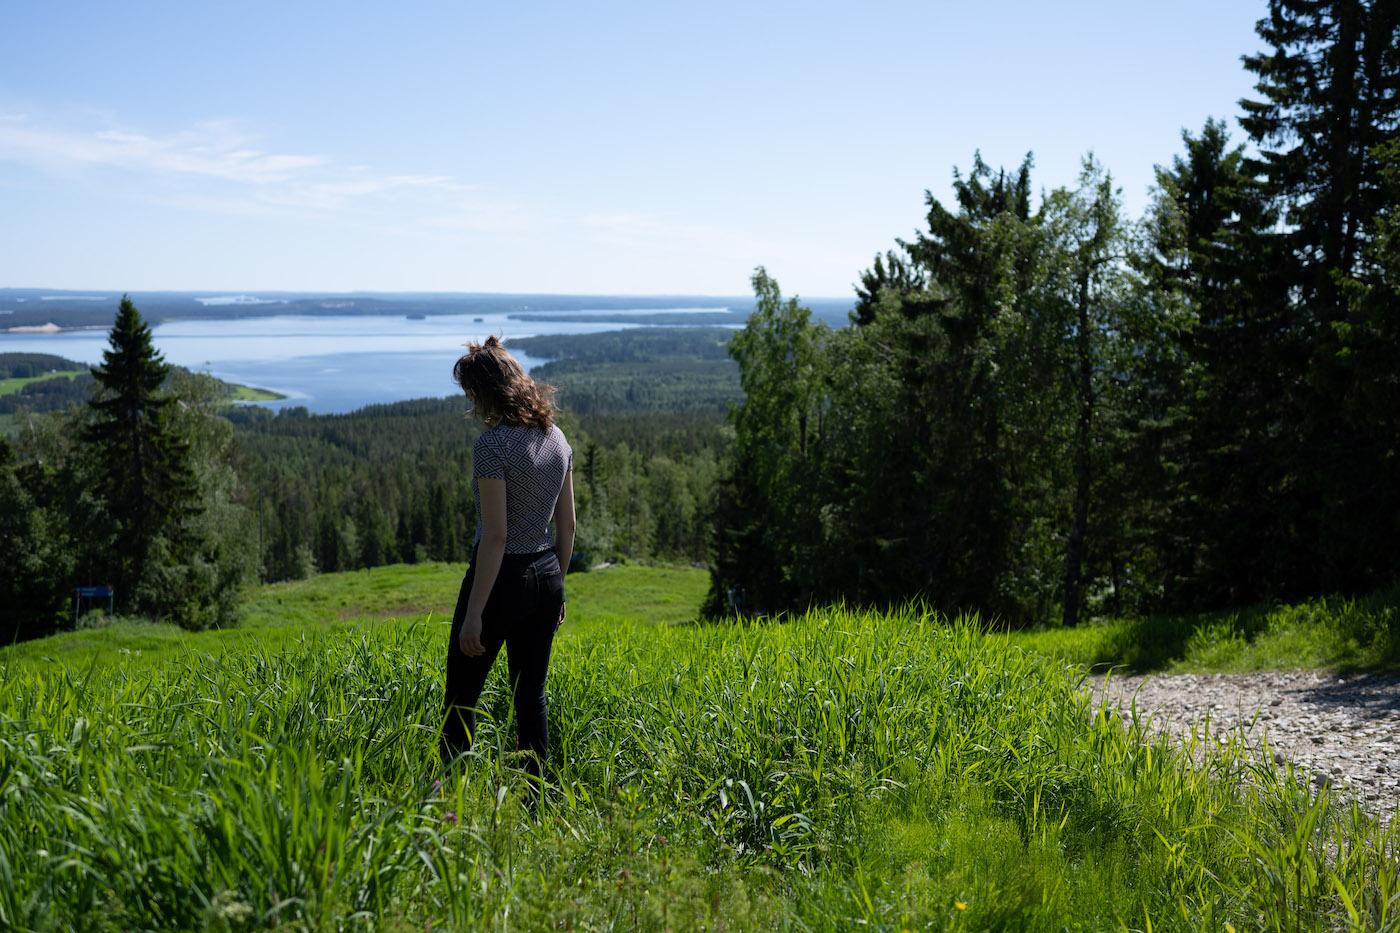 vuokatti hepokongas finland